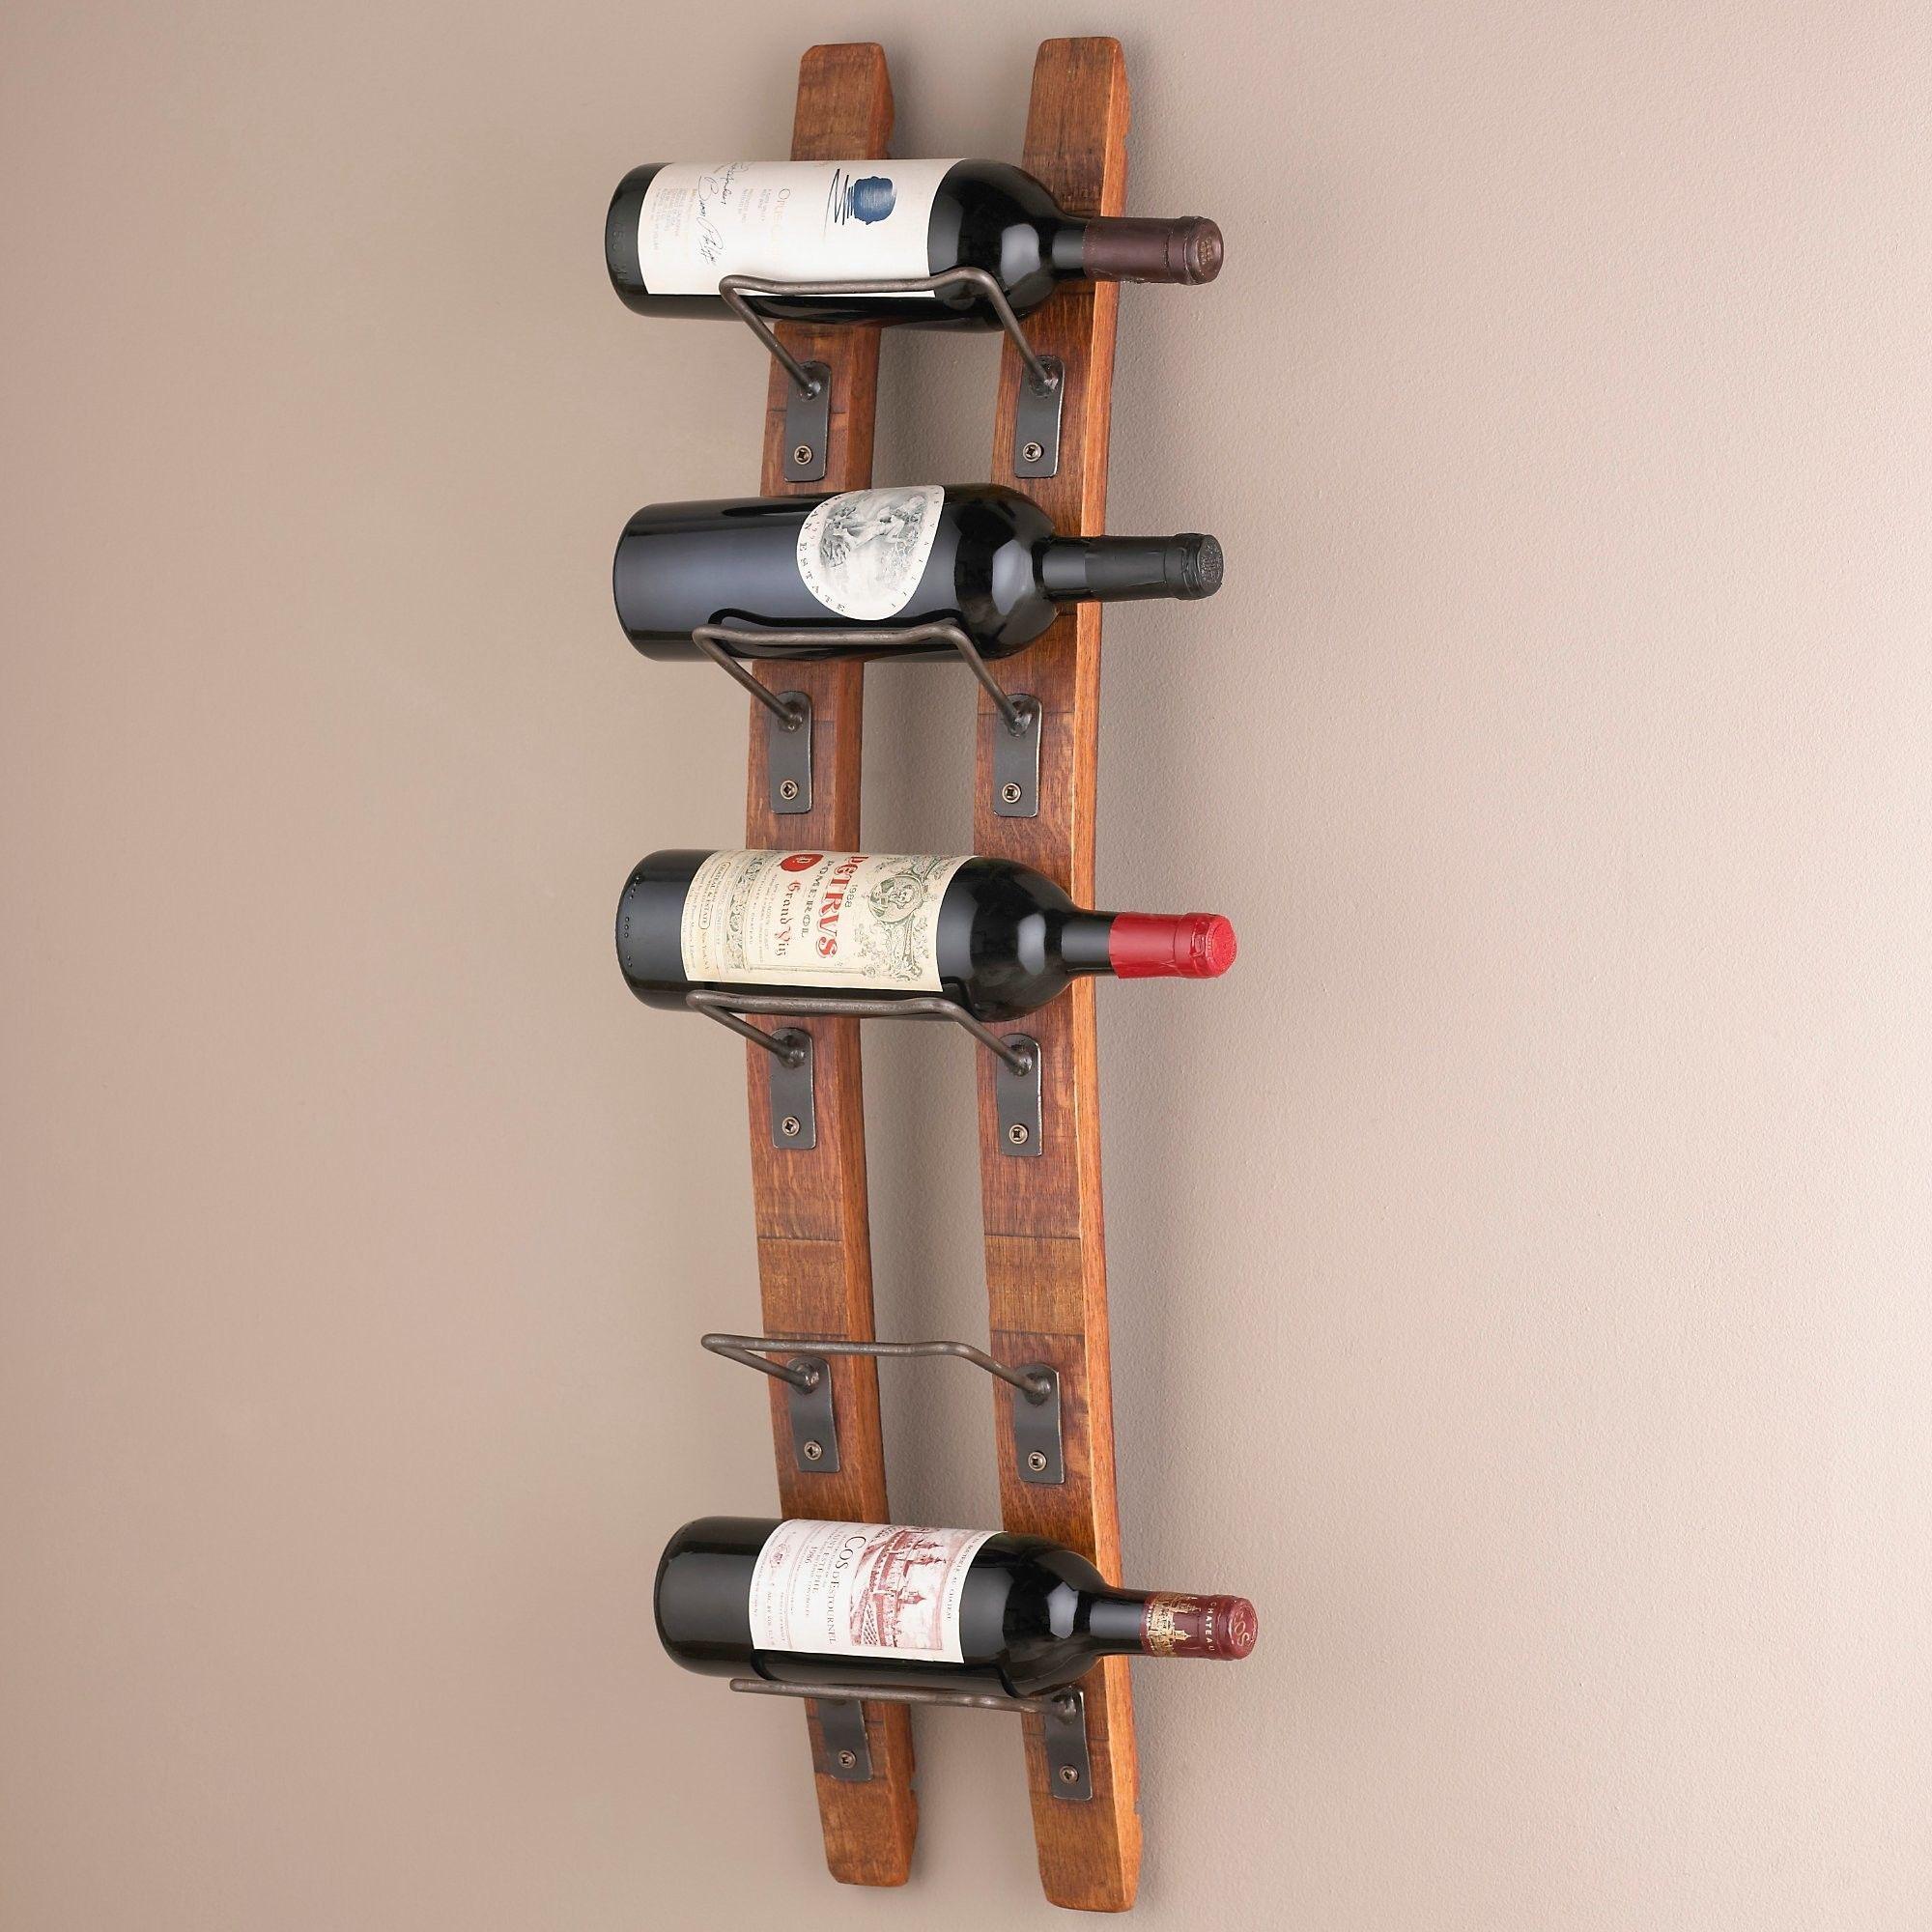 ideas creative in oa wine elegant image ikea wallhanging wall full mount mounted wood metal kitchen vintage racks rack